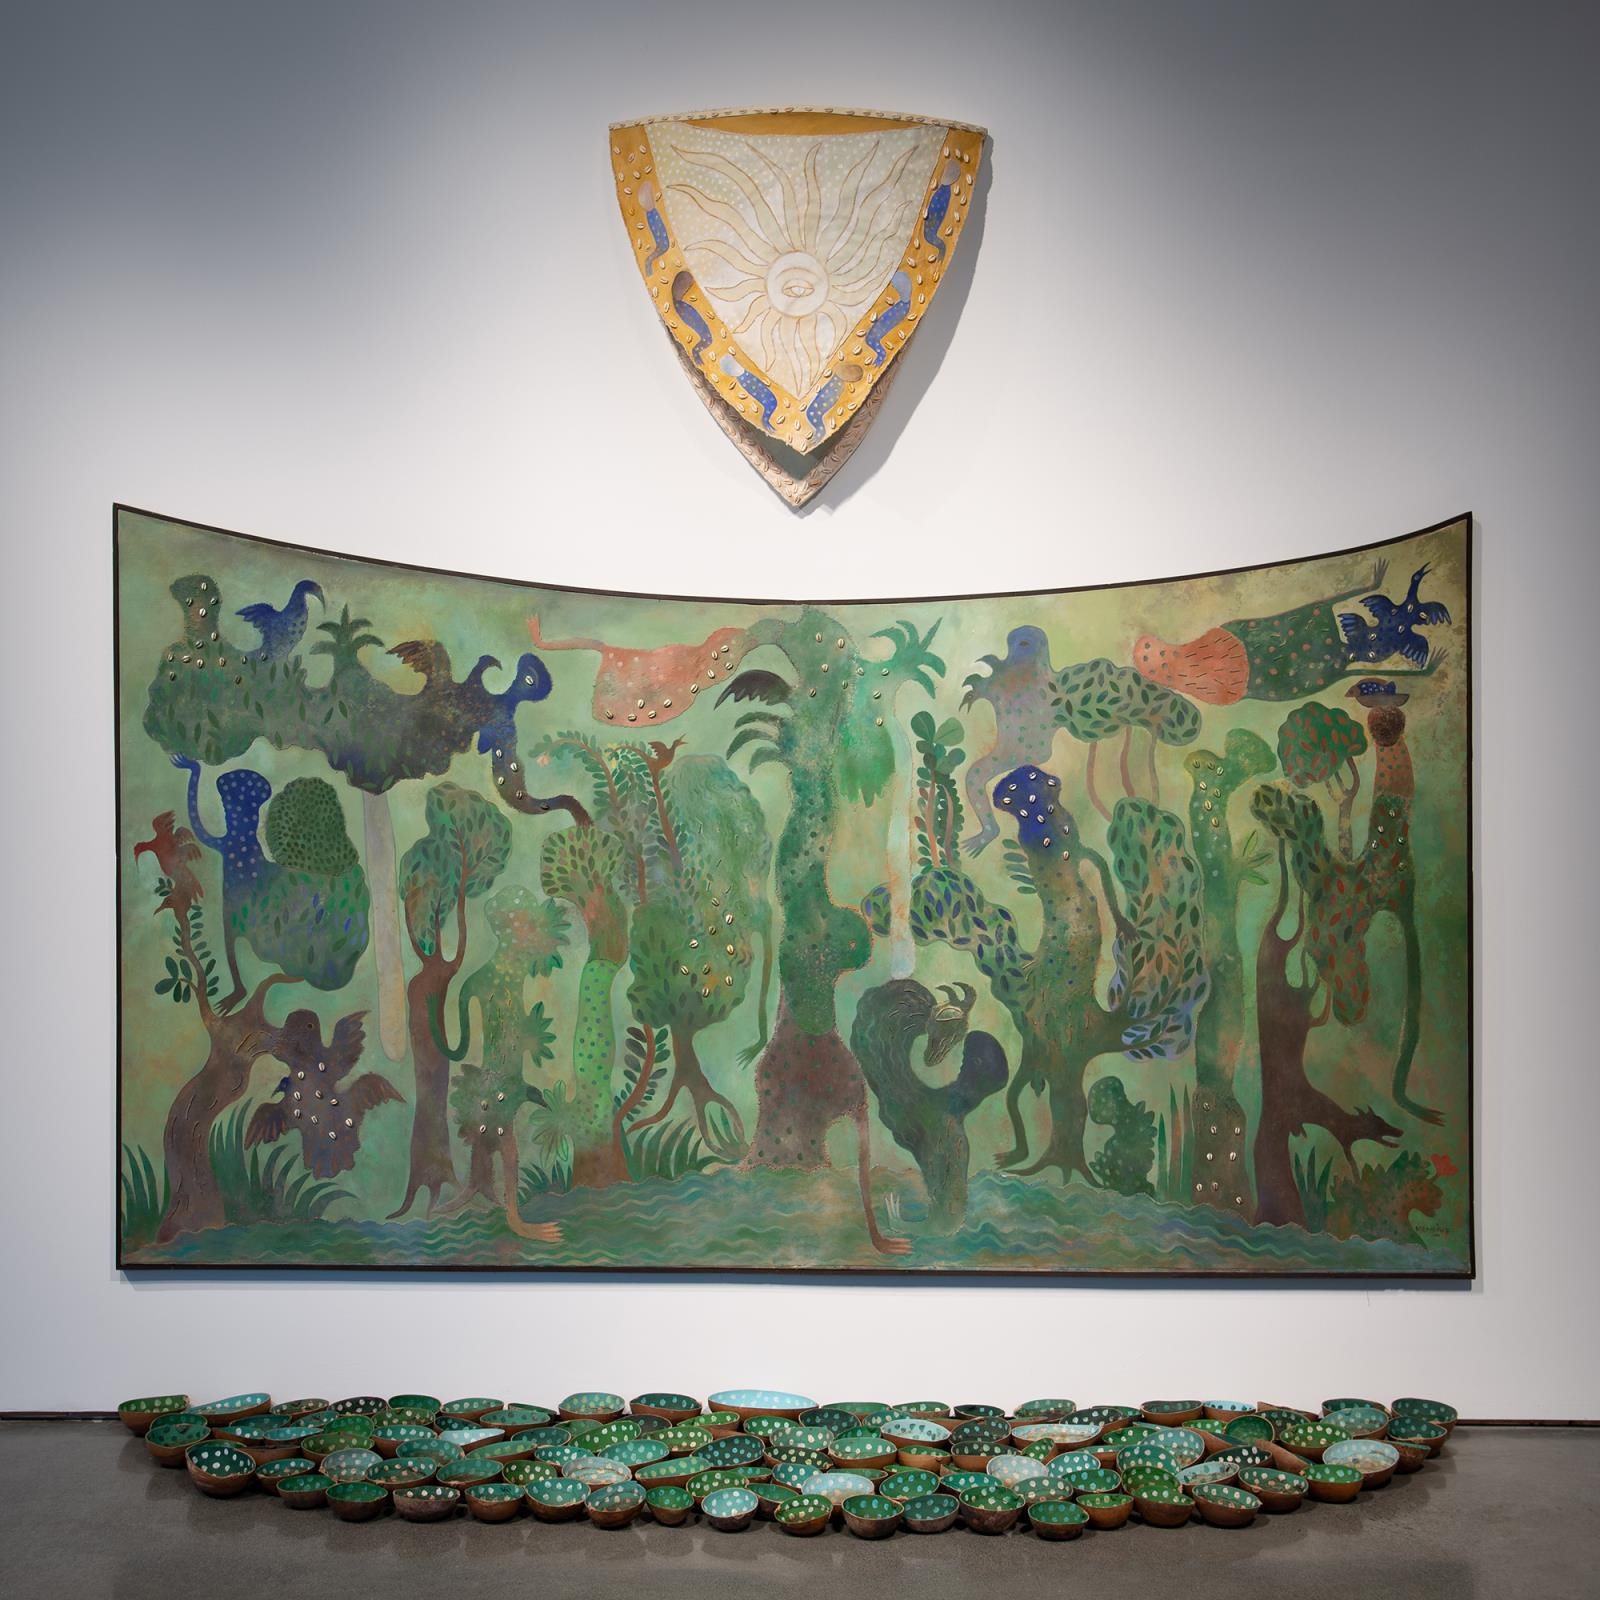 Manuel Mendive, The landscape and its owner, 2010